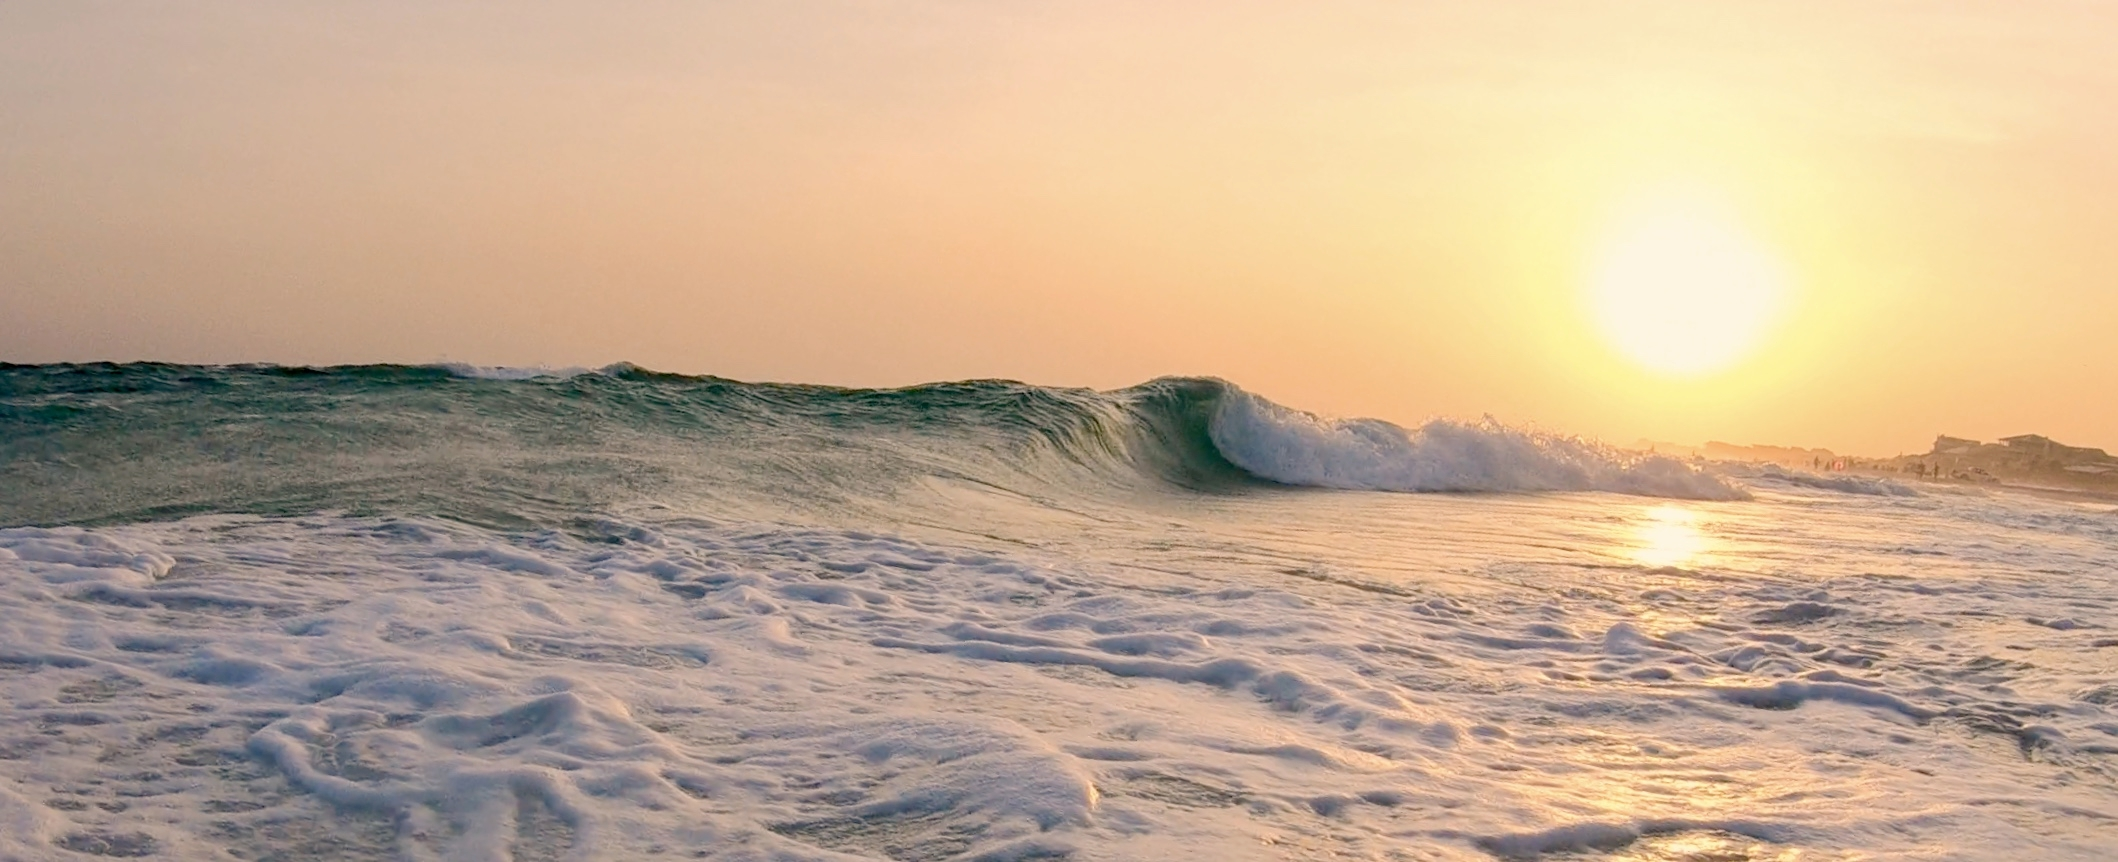 Grayton Beach, Florida - Top 5 Reasons